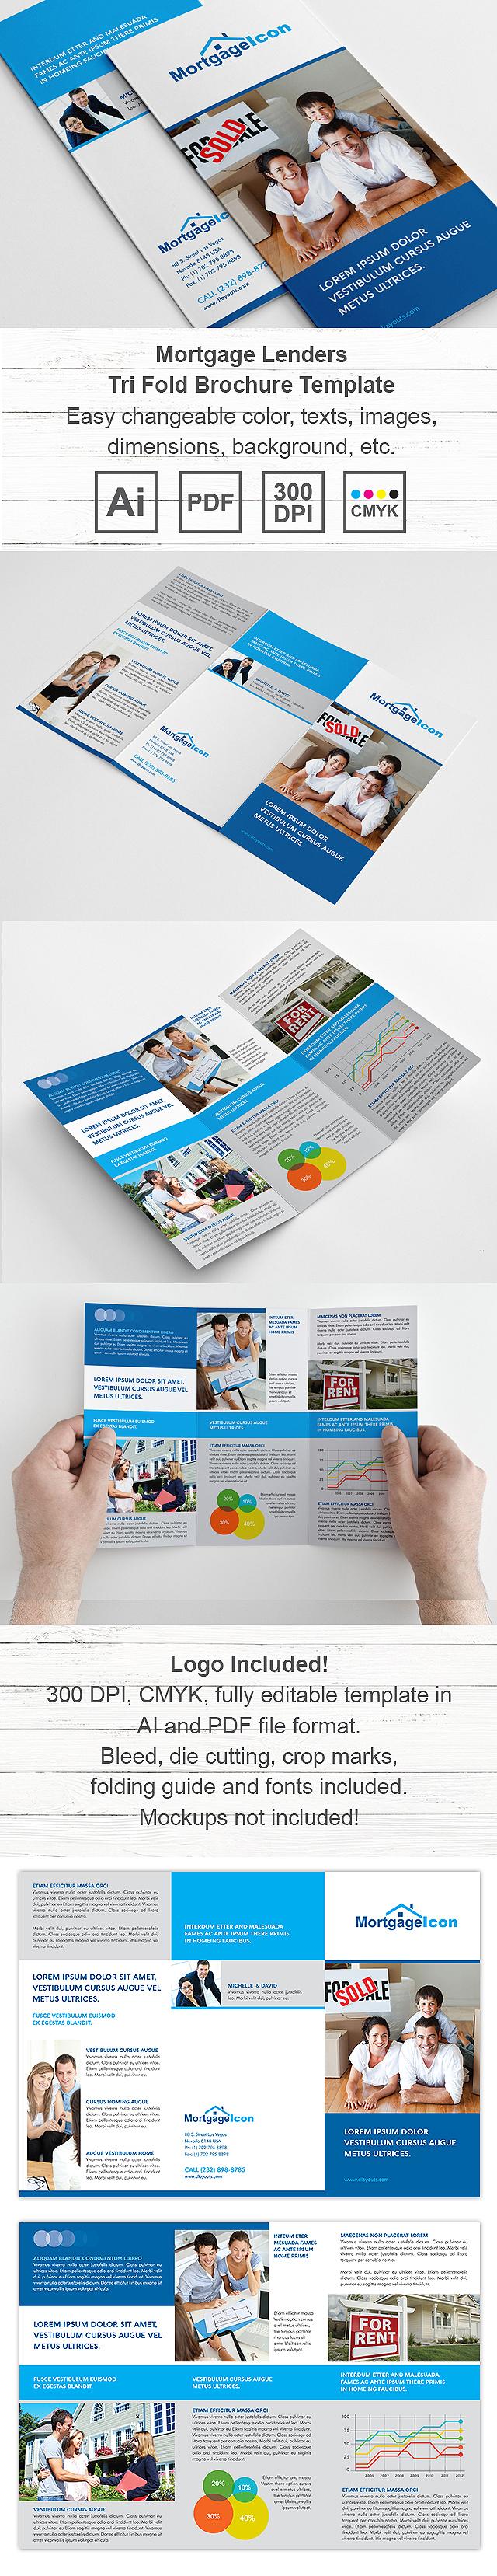 Mortgage Lenders Tri Fold Brochure Template Design - Mortgage broker flyer template